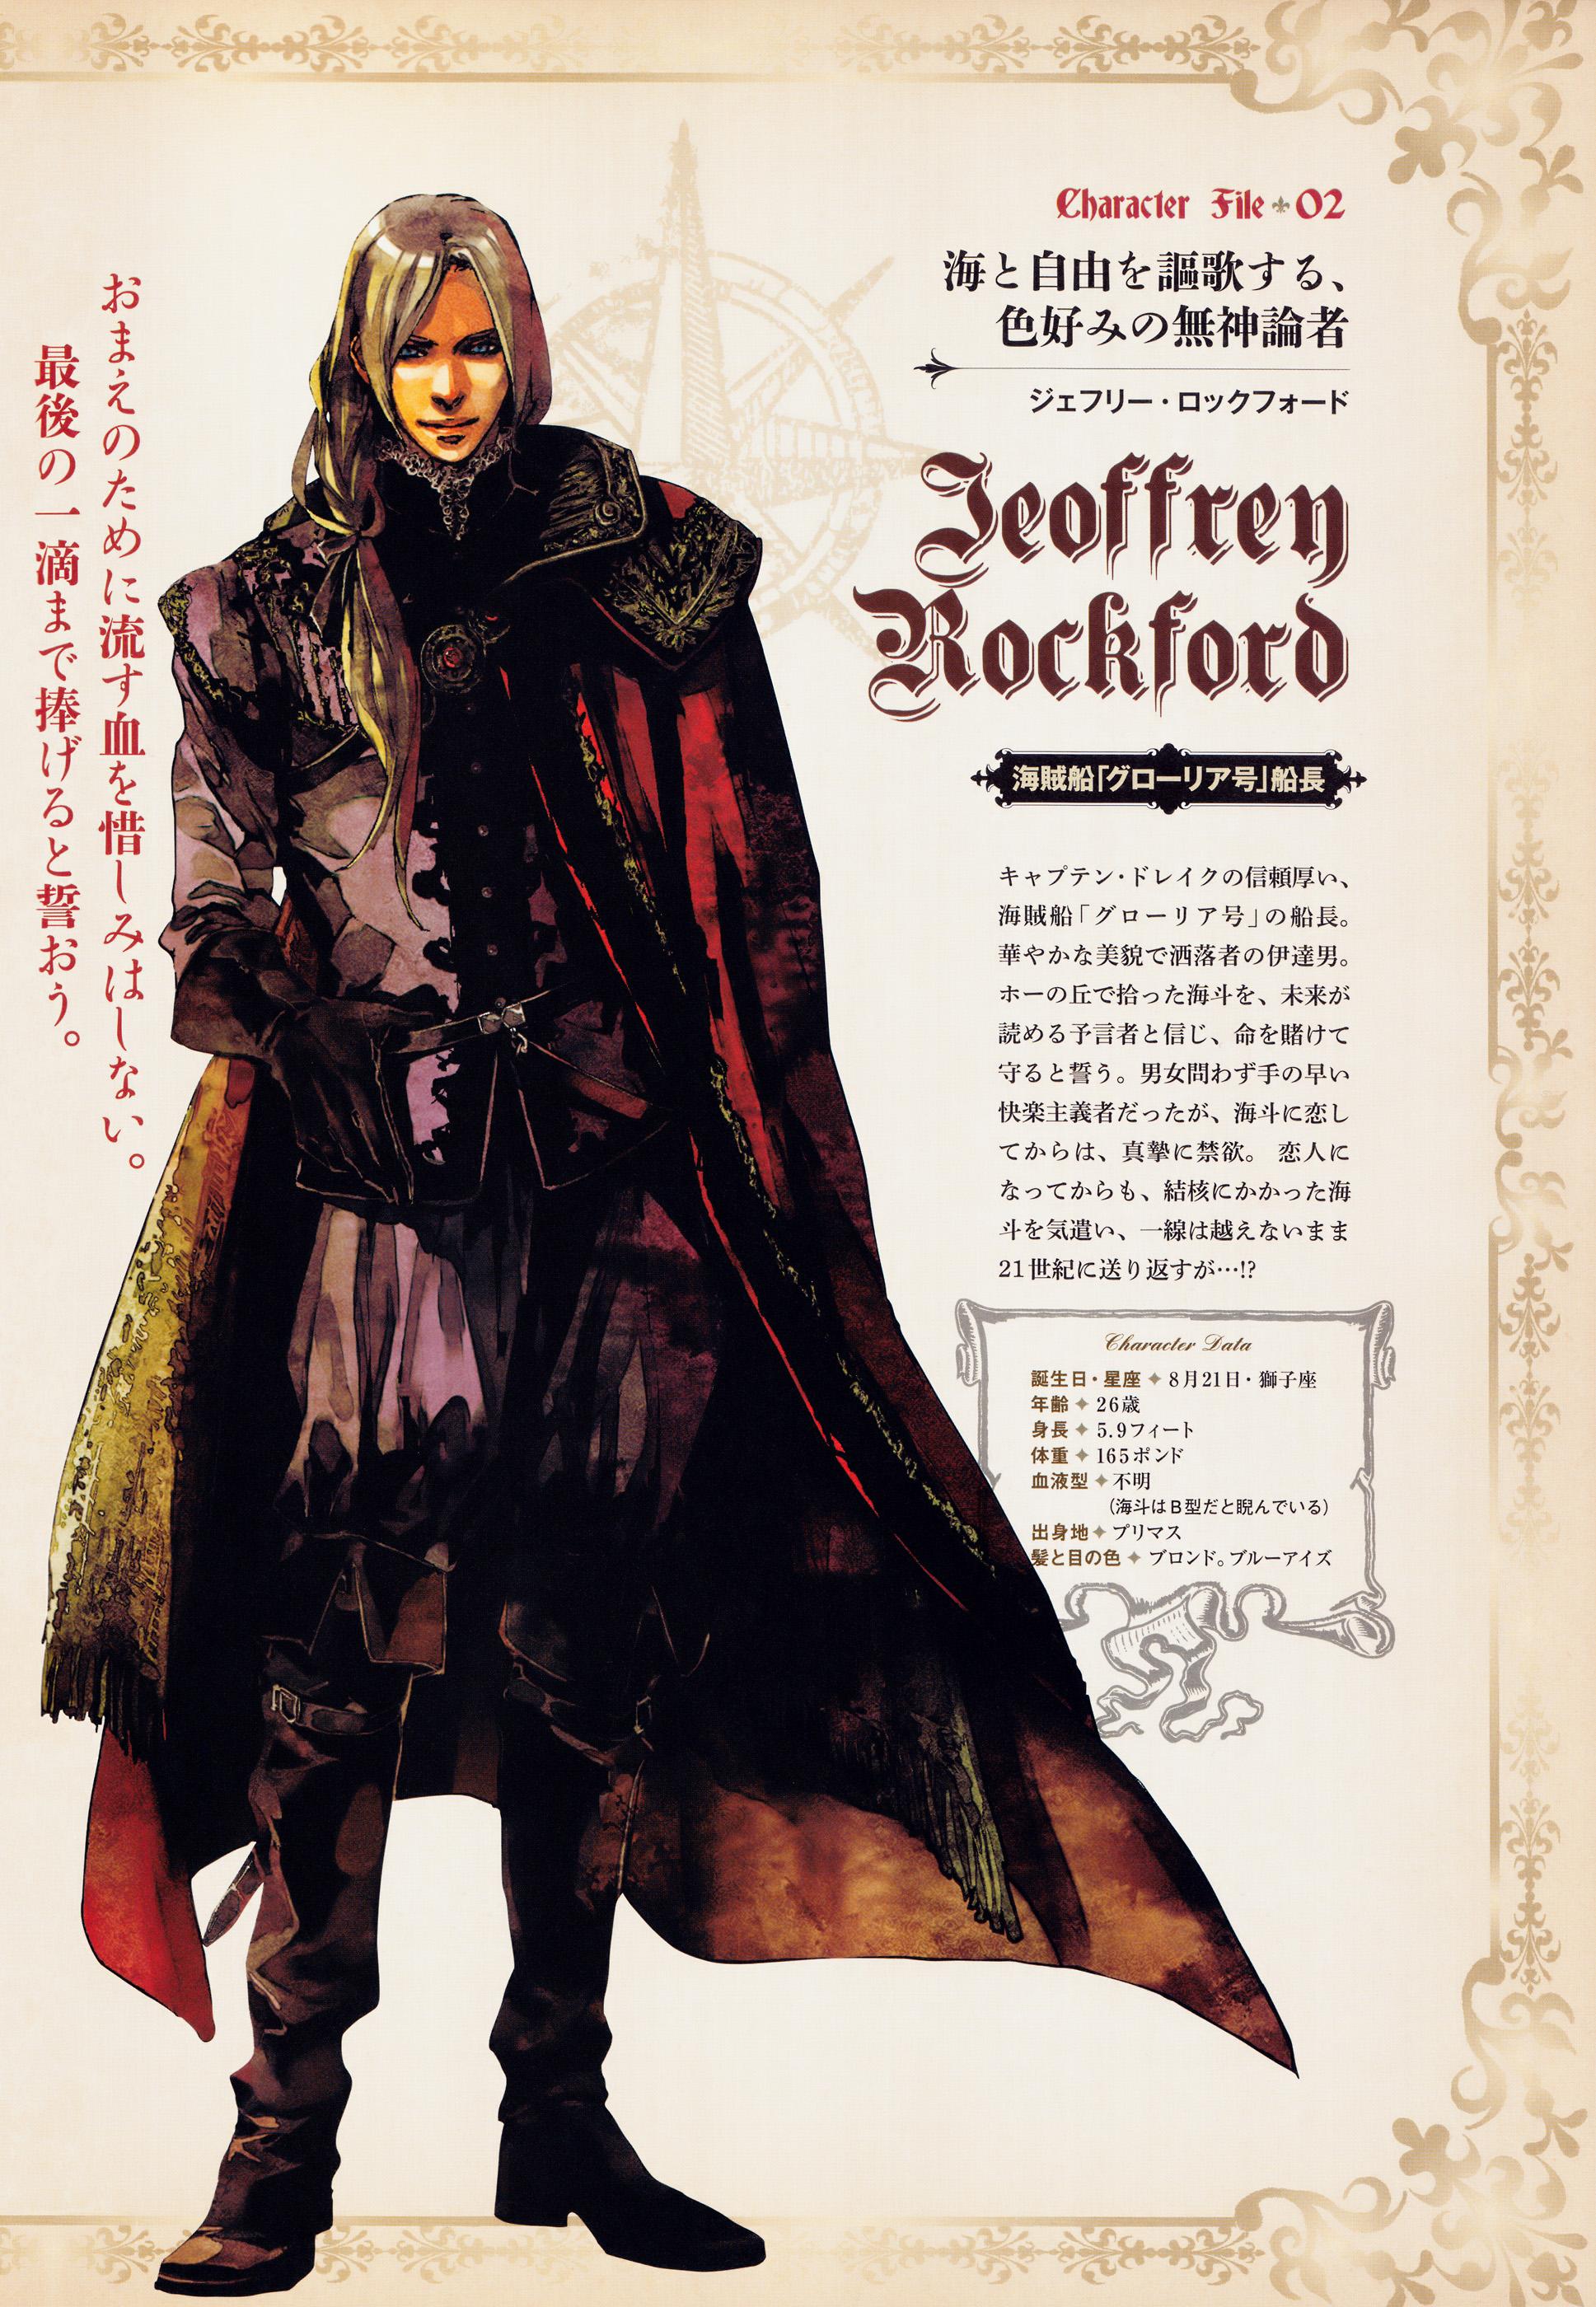 FLESH & BLOOD - Characters (3)